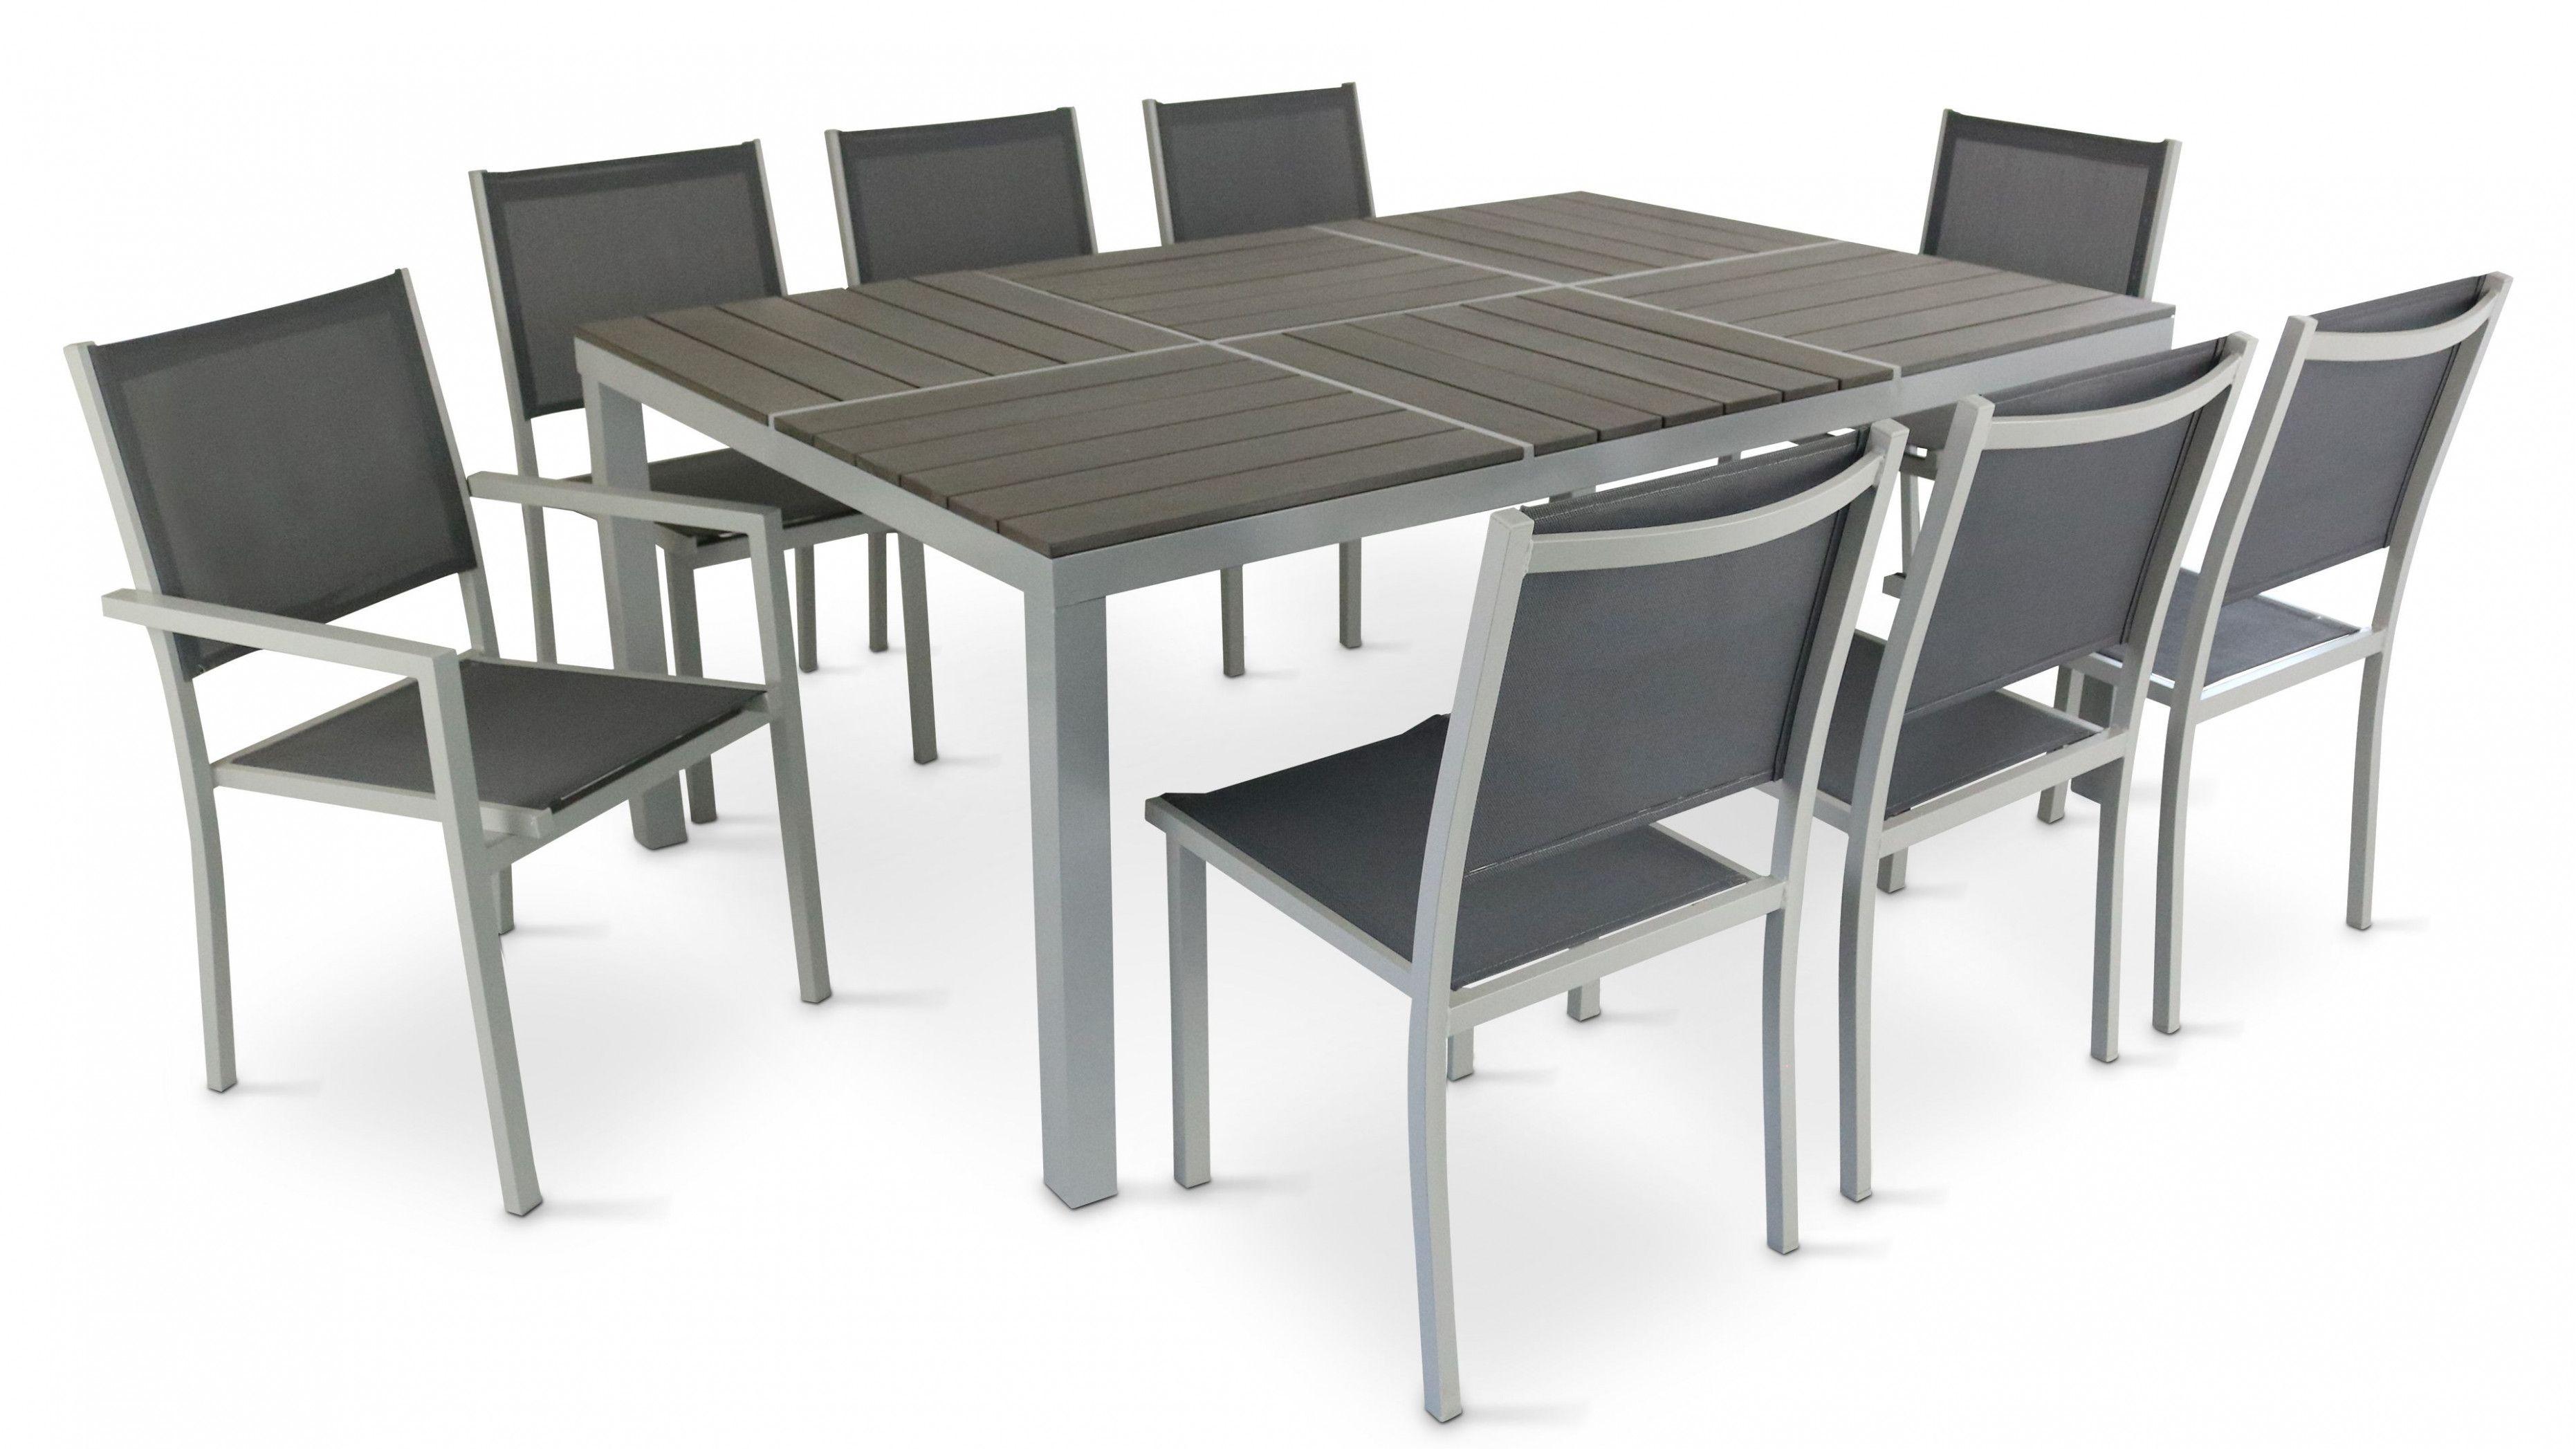 Table De Jardin Ouedkniss Outdoor Furniture Sets Furniture Sets Outdoor Tables